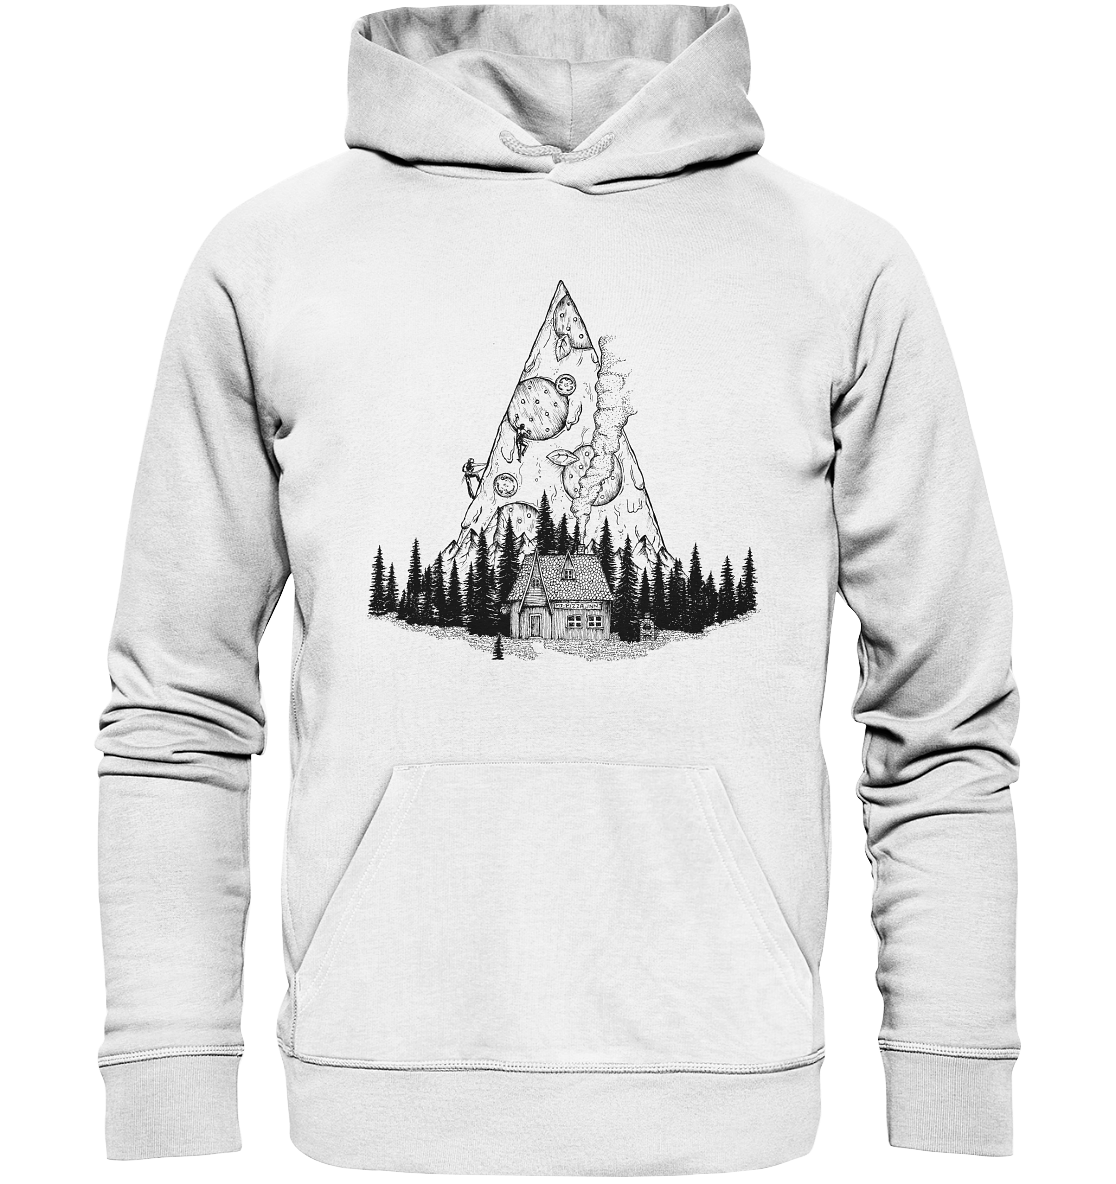 front-organic-hoodie-f8f8f8-1116x-6.png